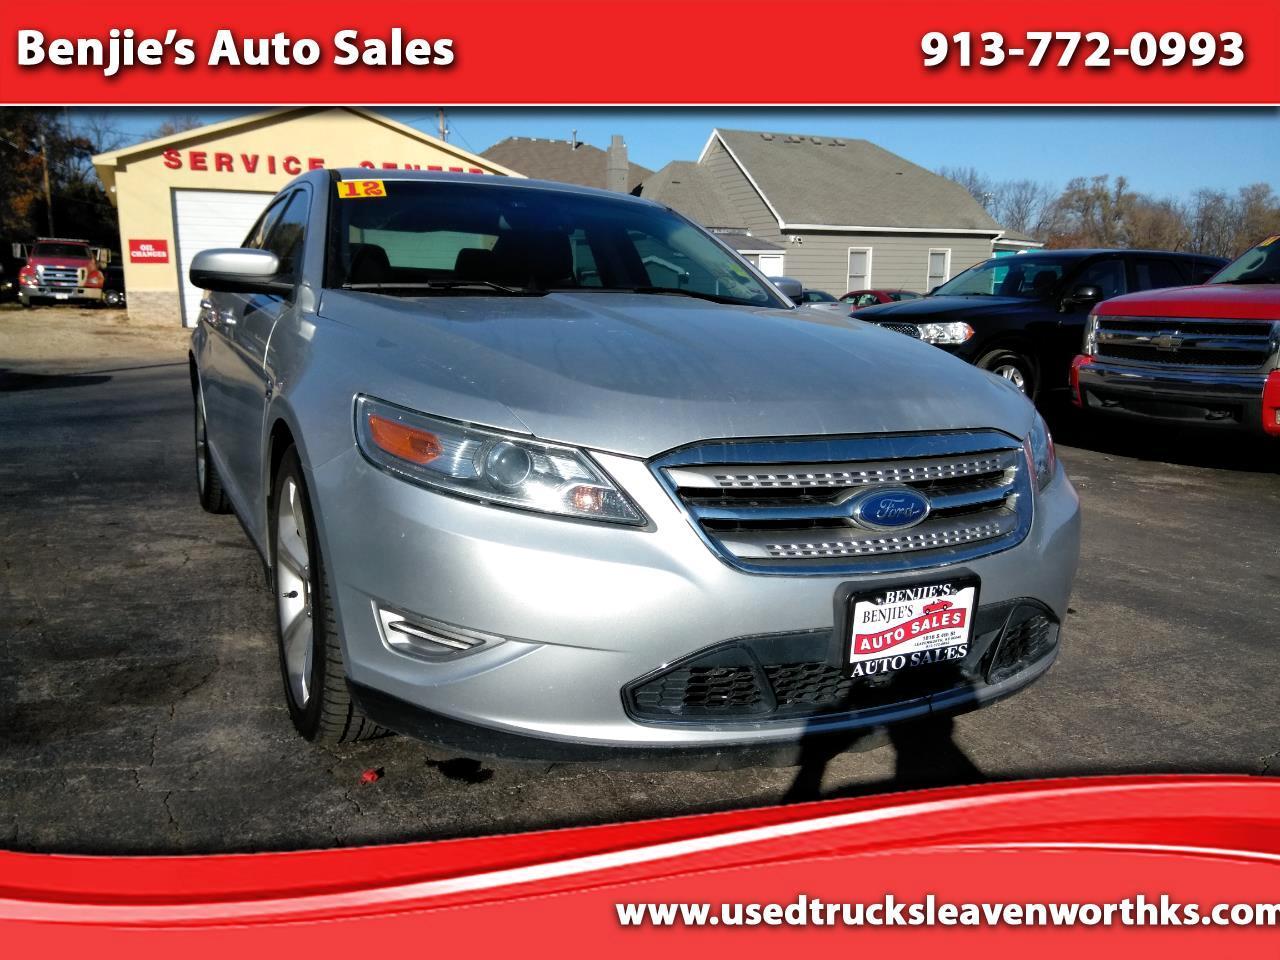 2012 Ford Taurus SHO AWD